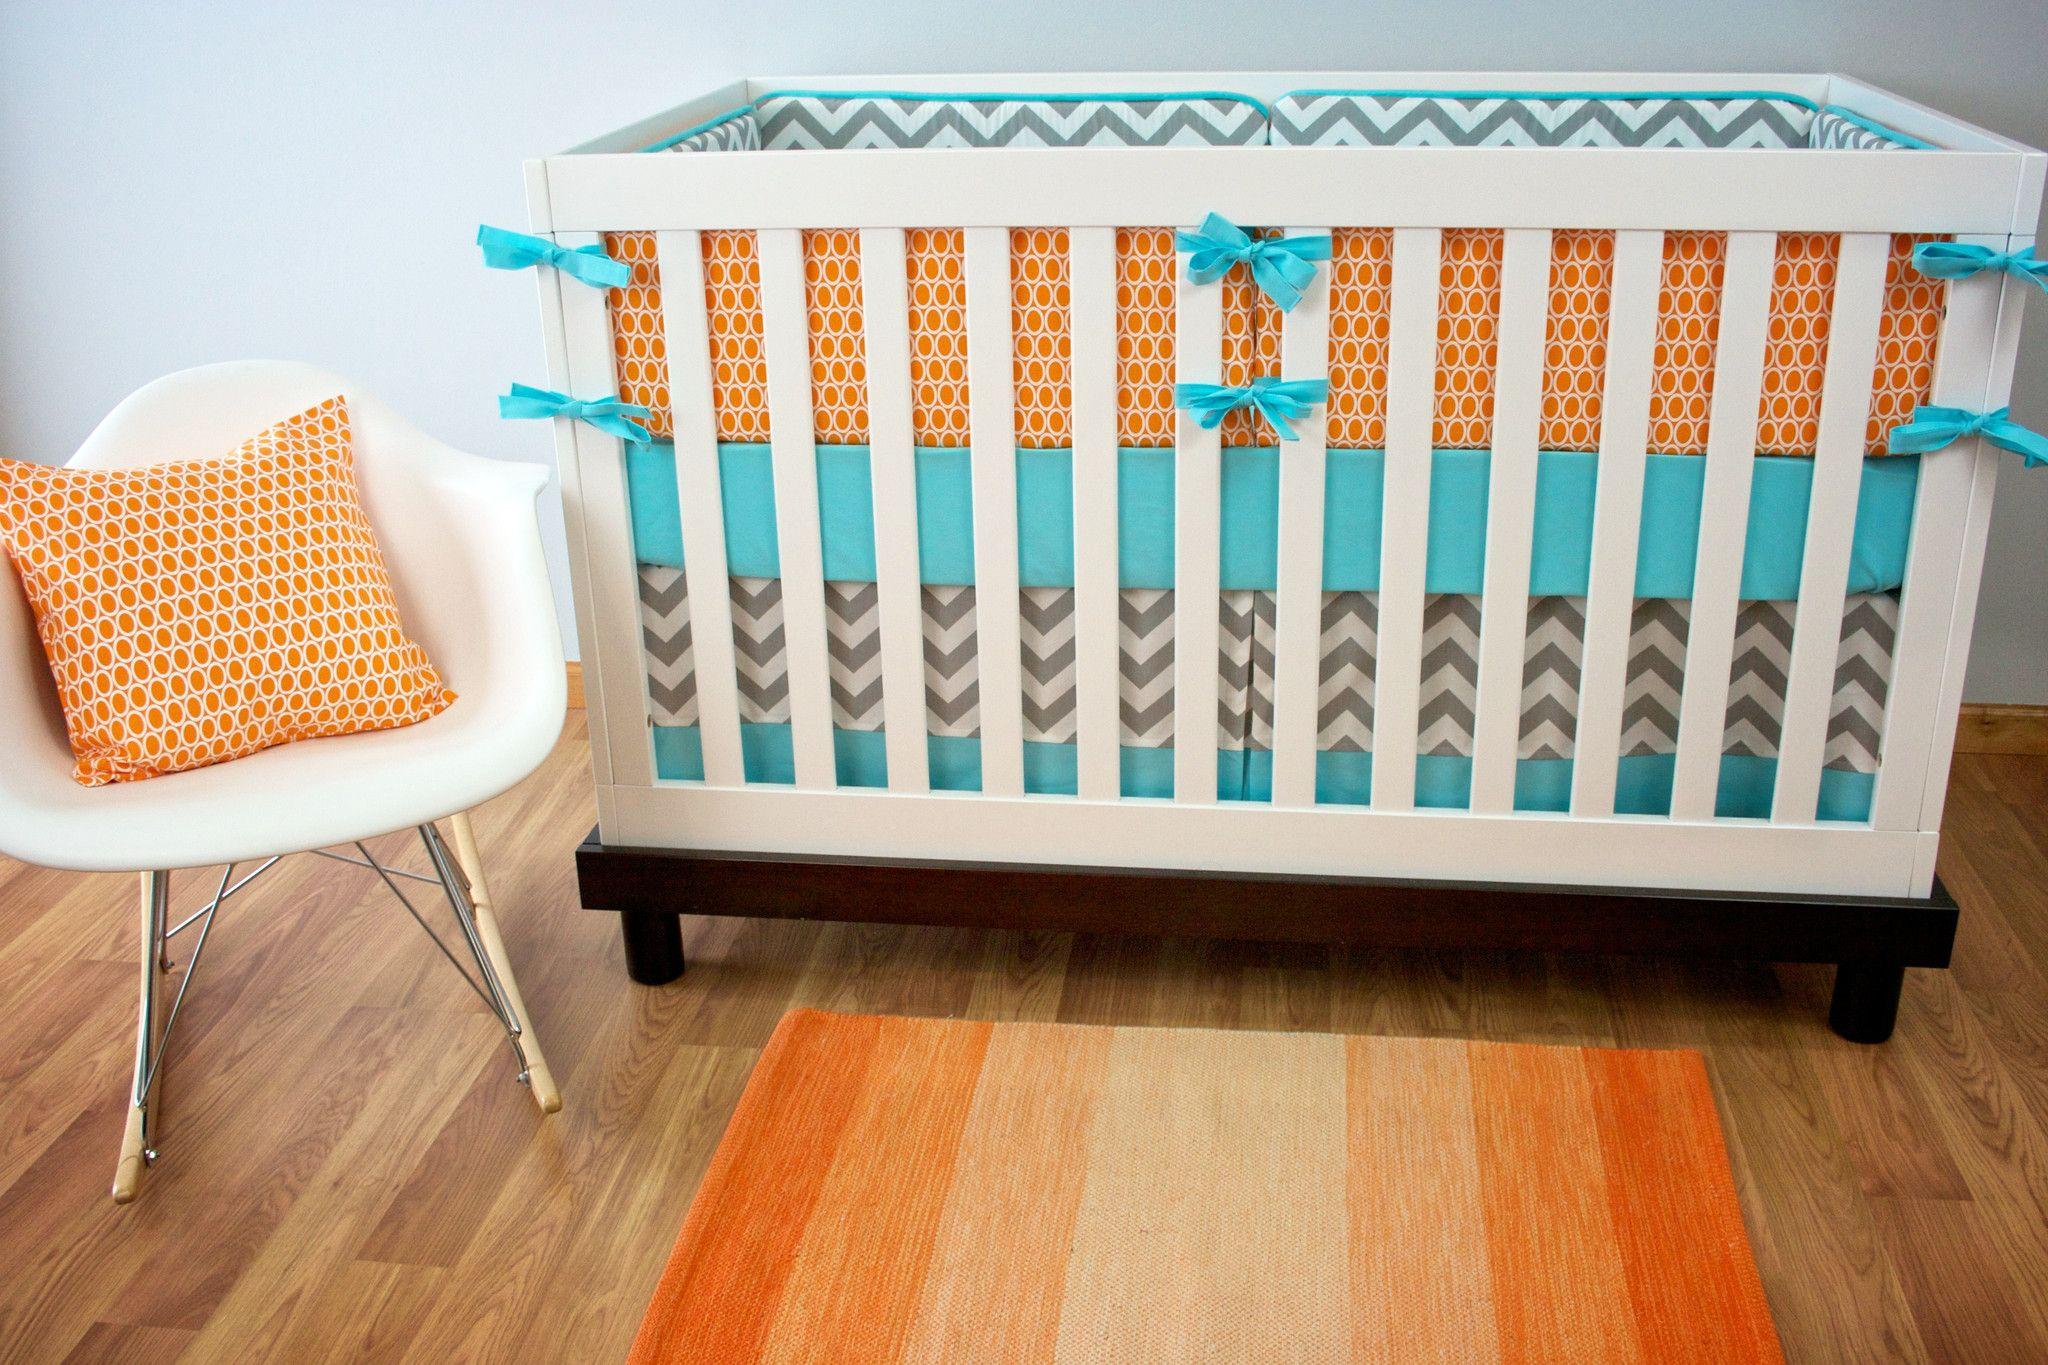 Aqua Orange Crib Set Baby Bedding Crib Bedding Gender Neutral Nursery Modified Tot Gender Neutral Nursery